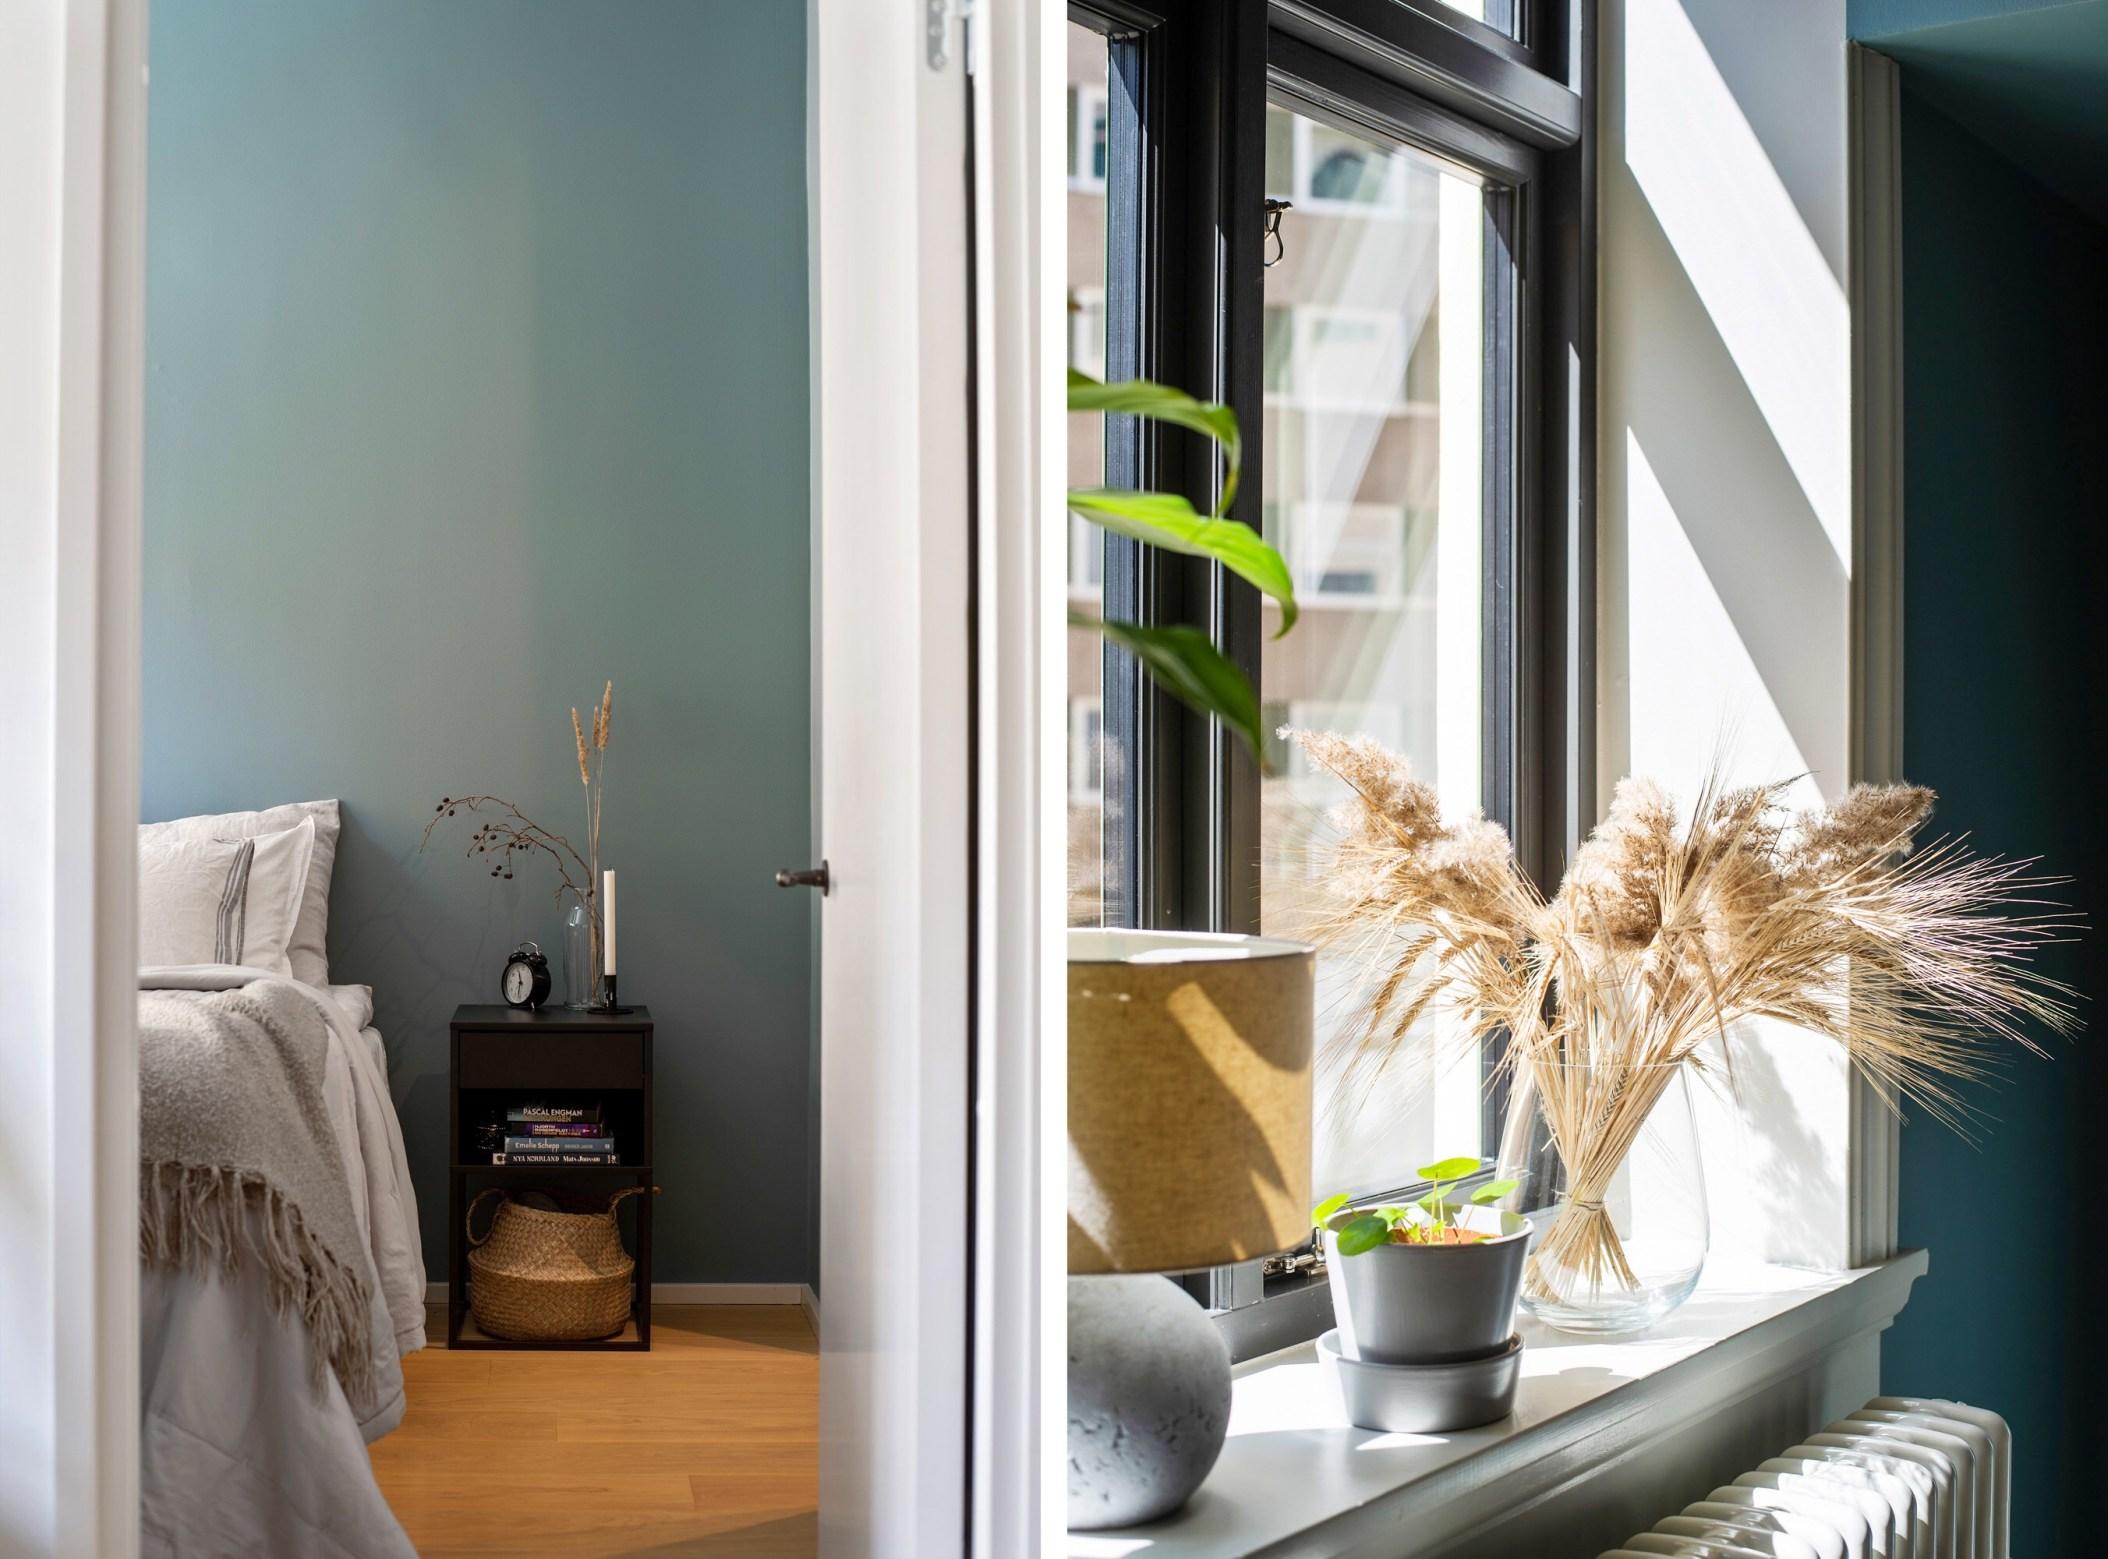 bedroom window sill